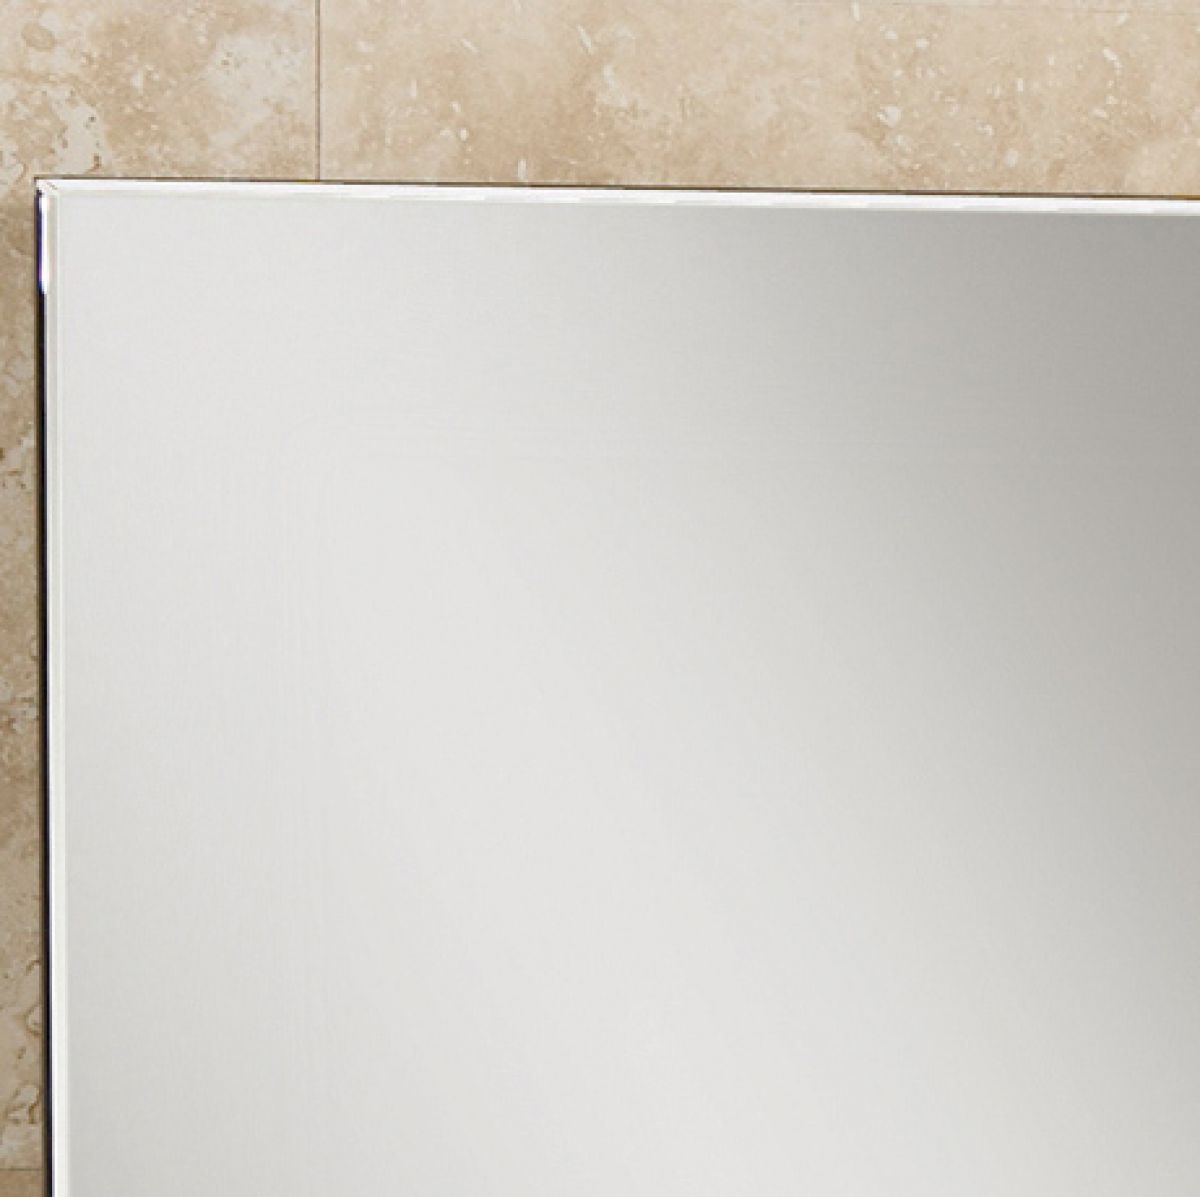 Hib Willow Landscape Bathroom Mirror